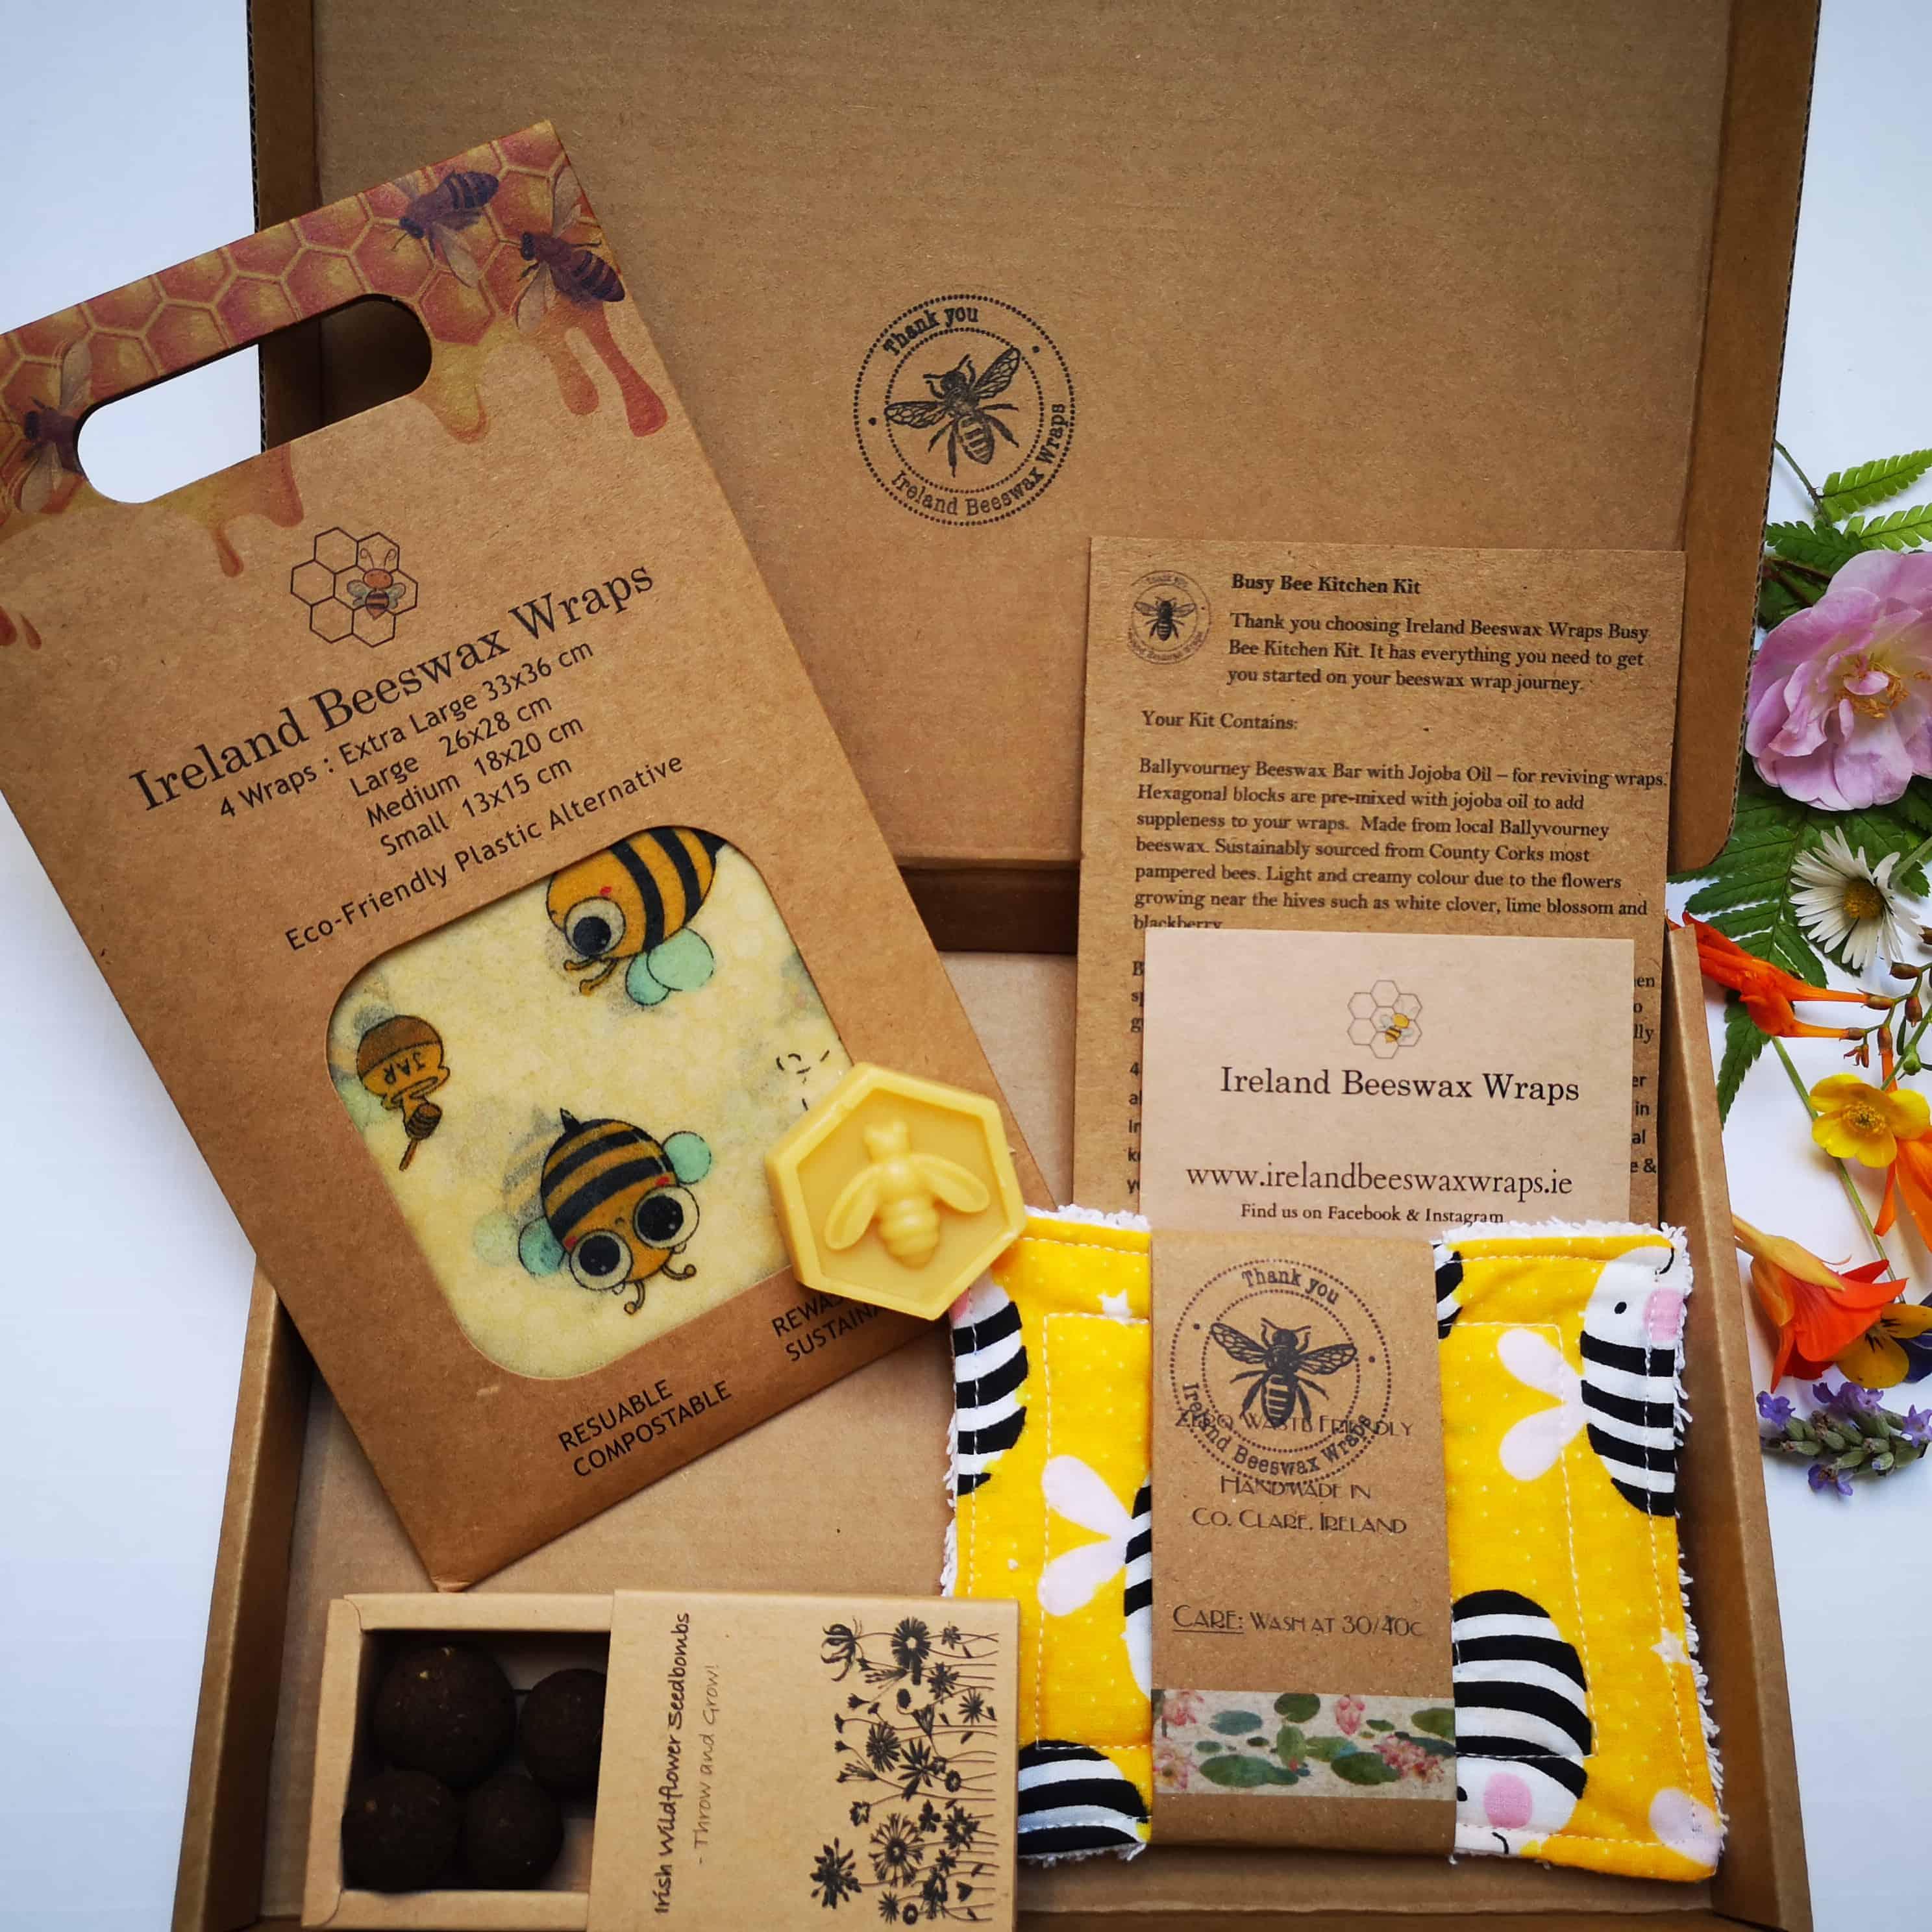 Busy Bee Kitchen Kit Ireland Beeswax Wraps